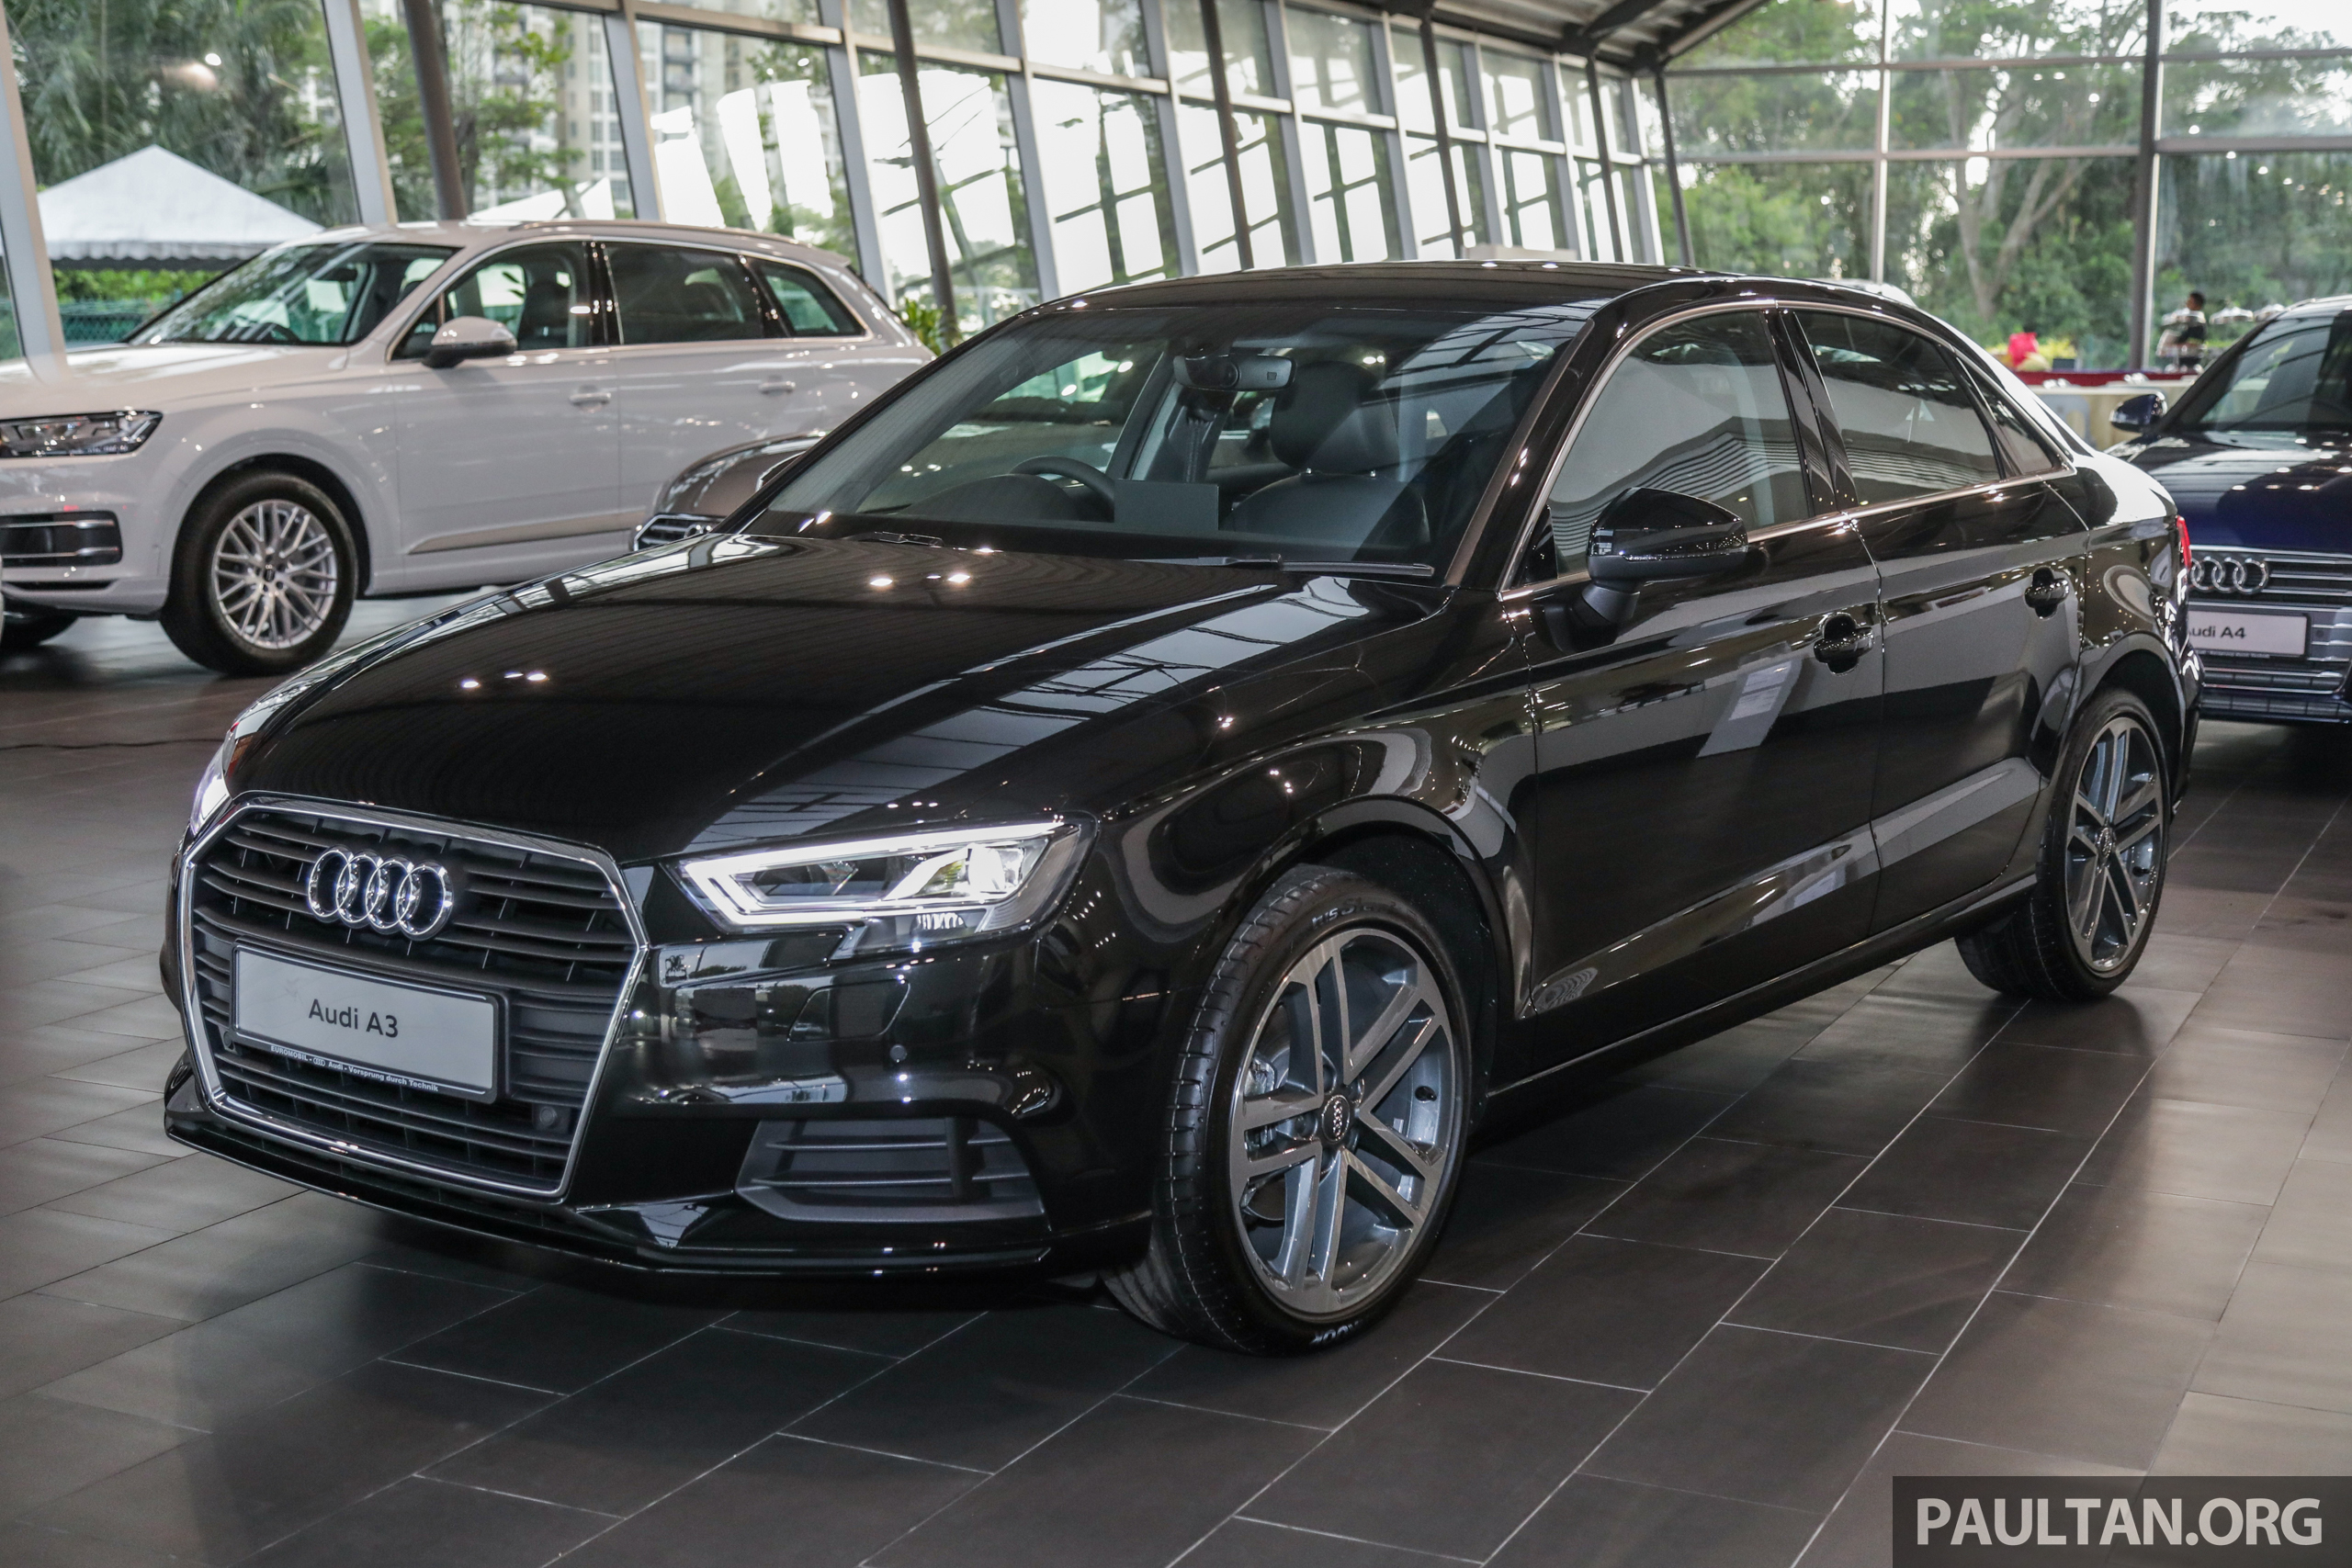 Audi A3 Sedan Facelift In M Sia 1 4 Tfsi From Rm240k Paultan Org